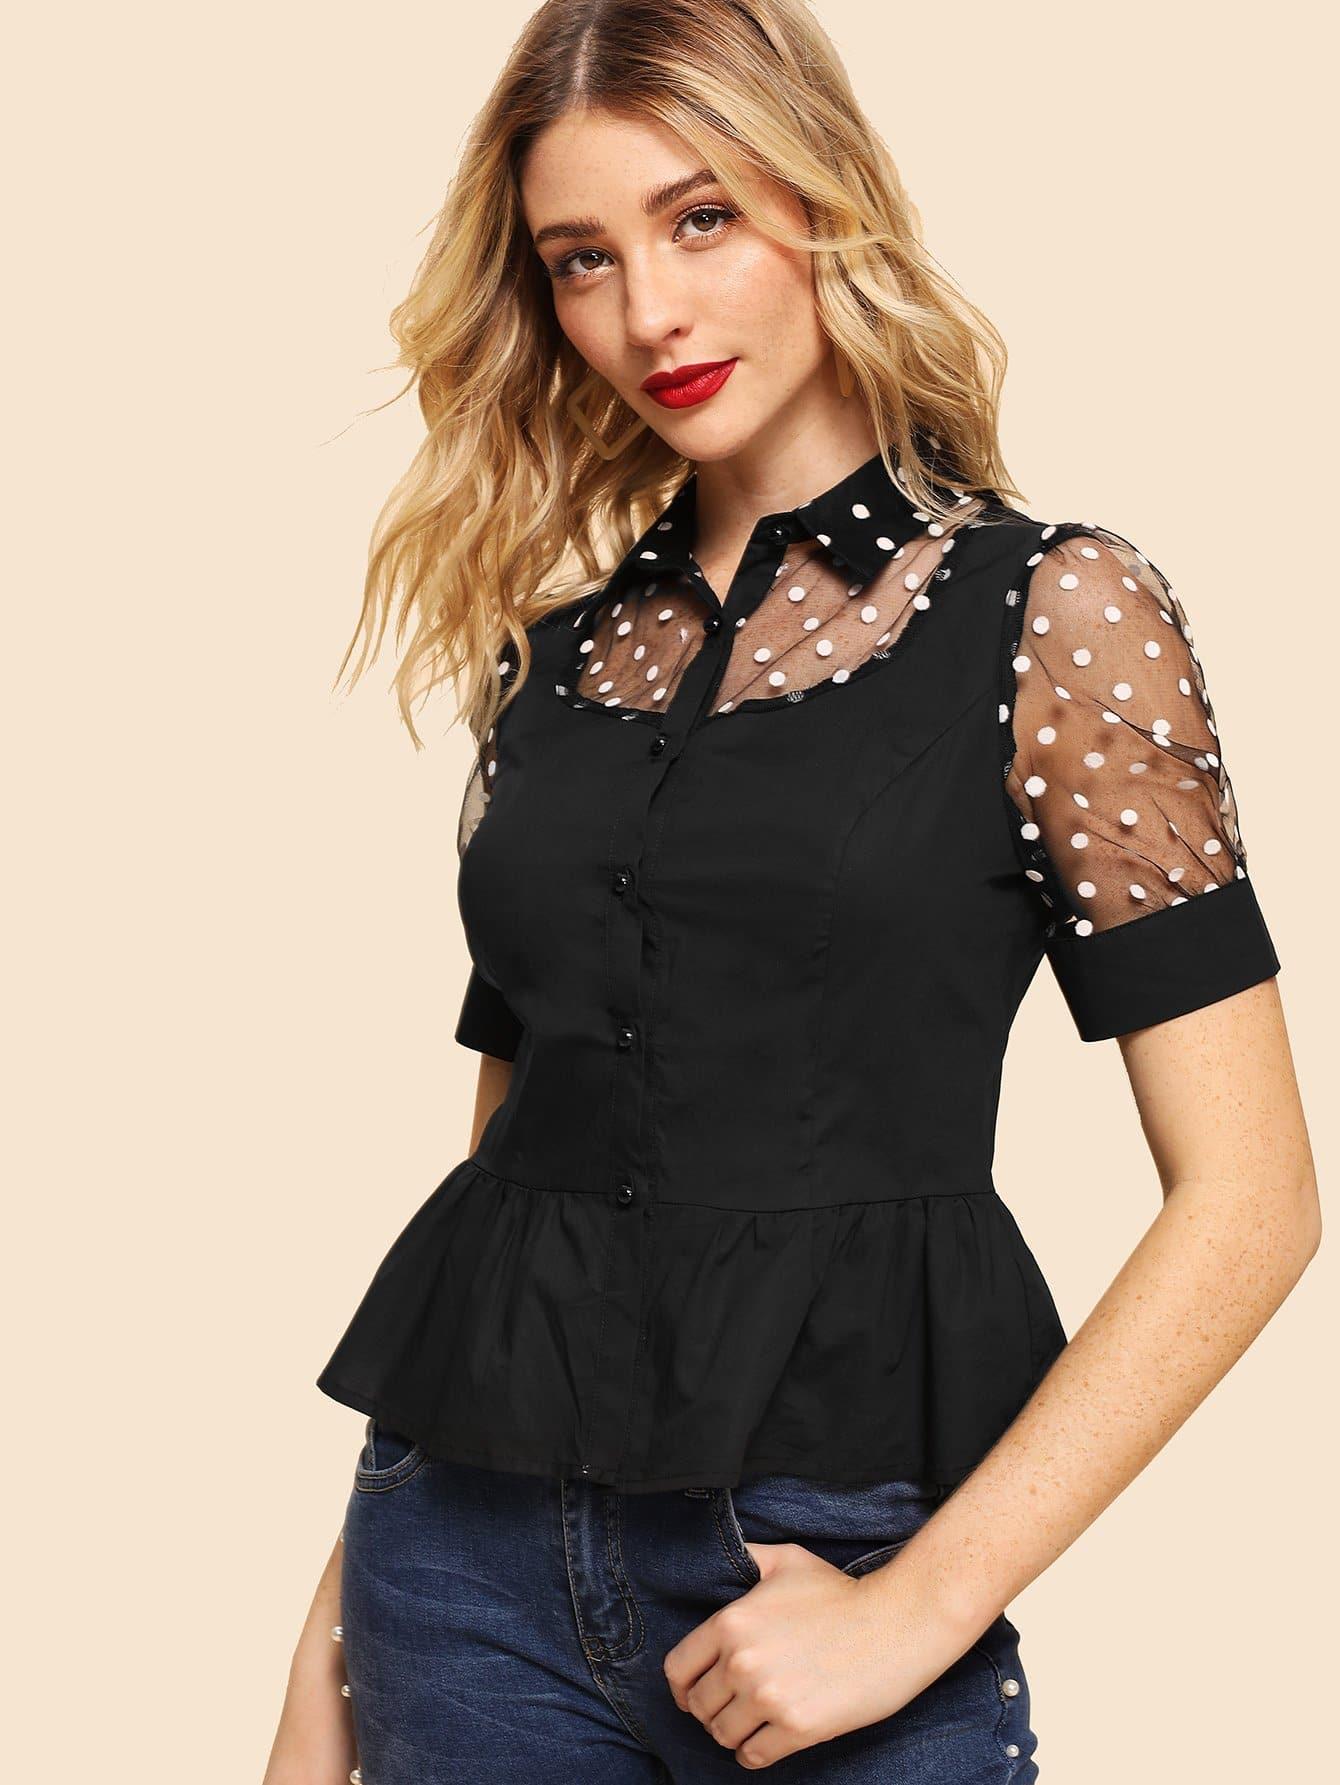 Купить Рубашка для рубашки из полоски Polka Dot Mesh, Nathane, SheIn